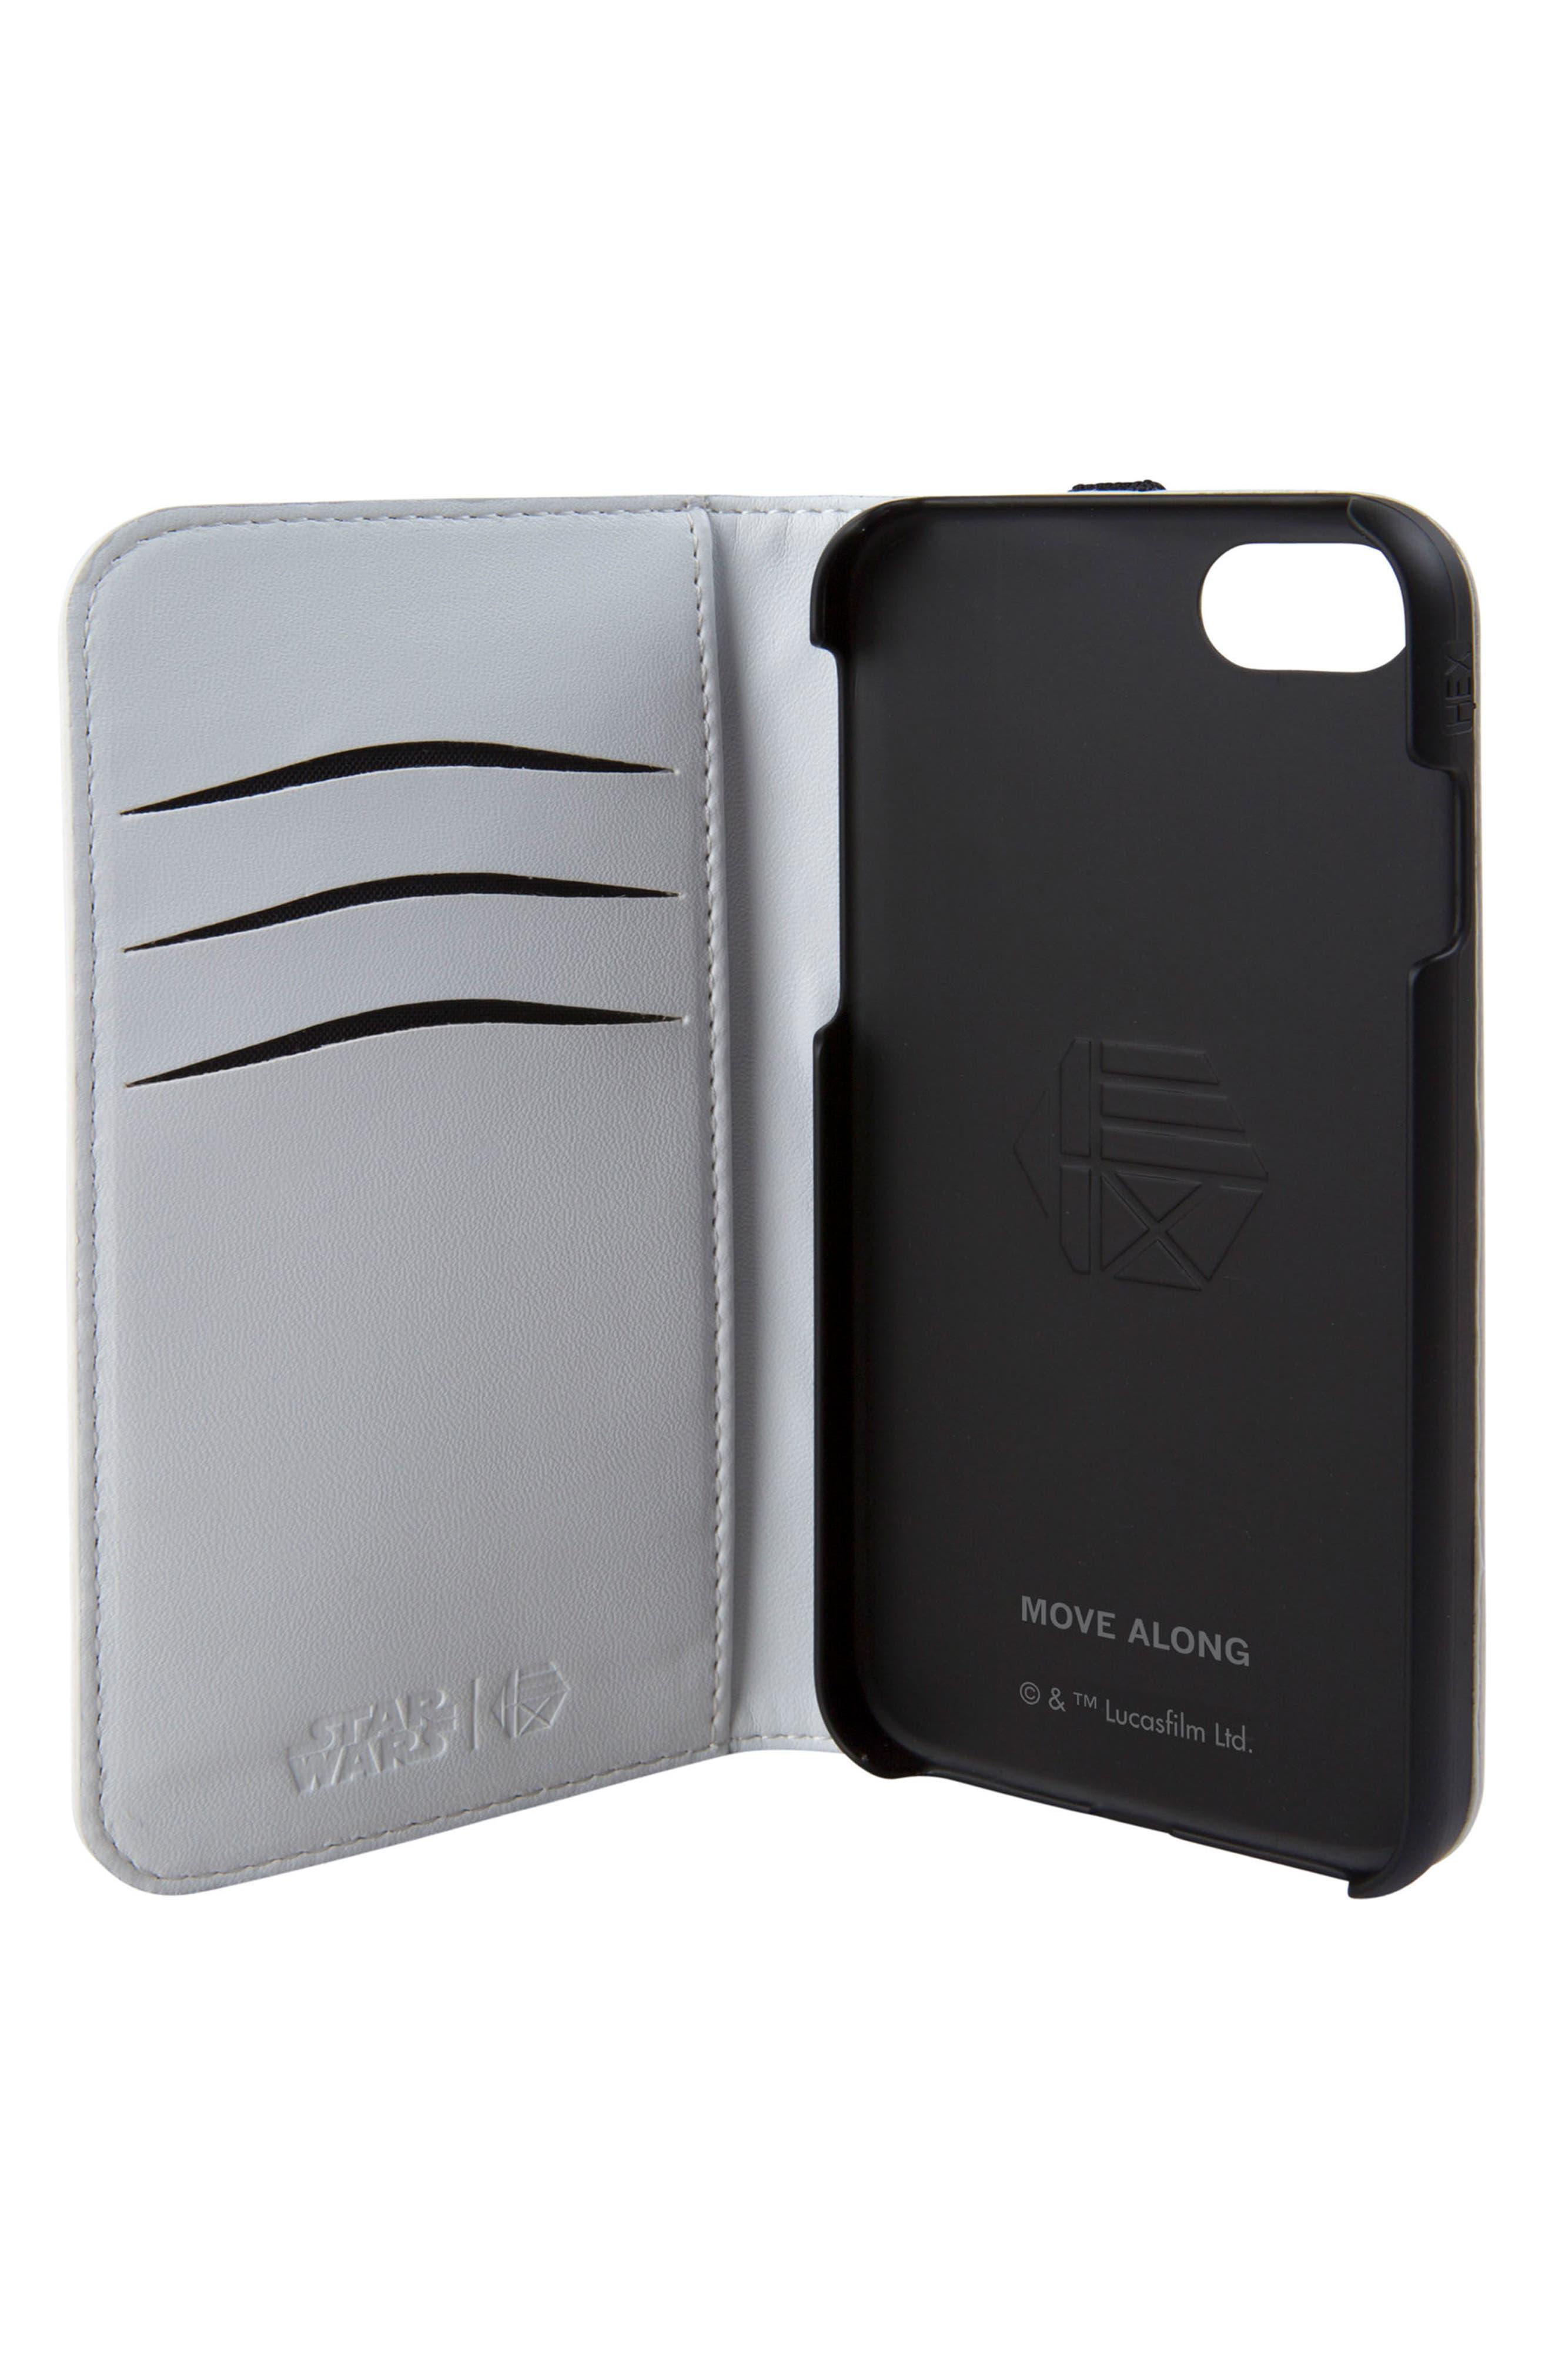 Stormtrooper iPhone 6/6s/7/8 Wallet Case,                             Alternate thumbnail 2, color,                             White